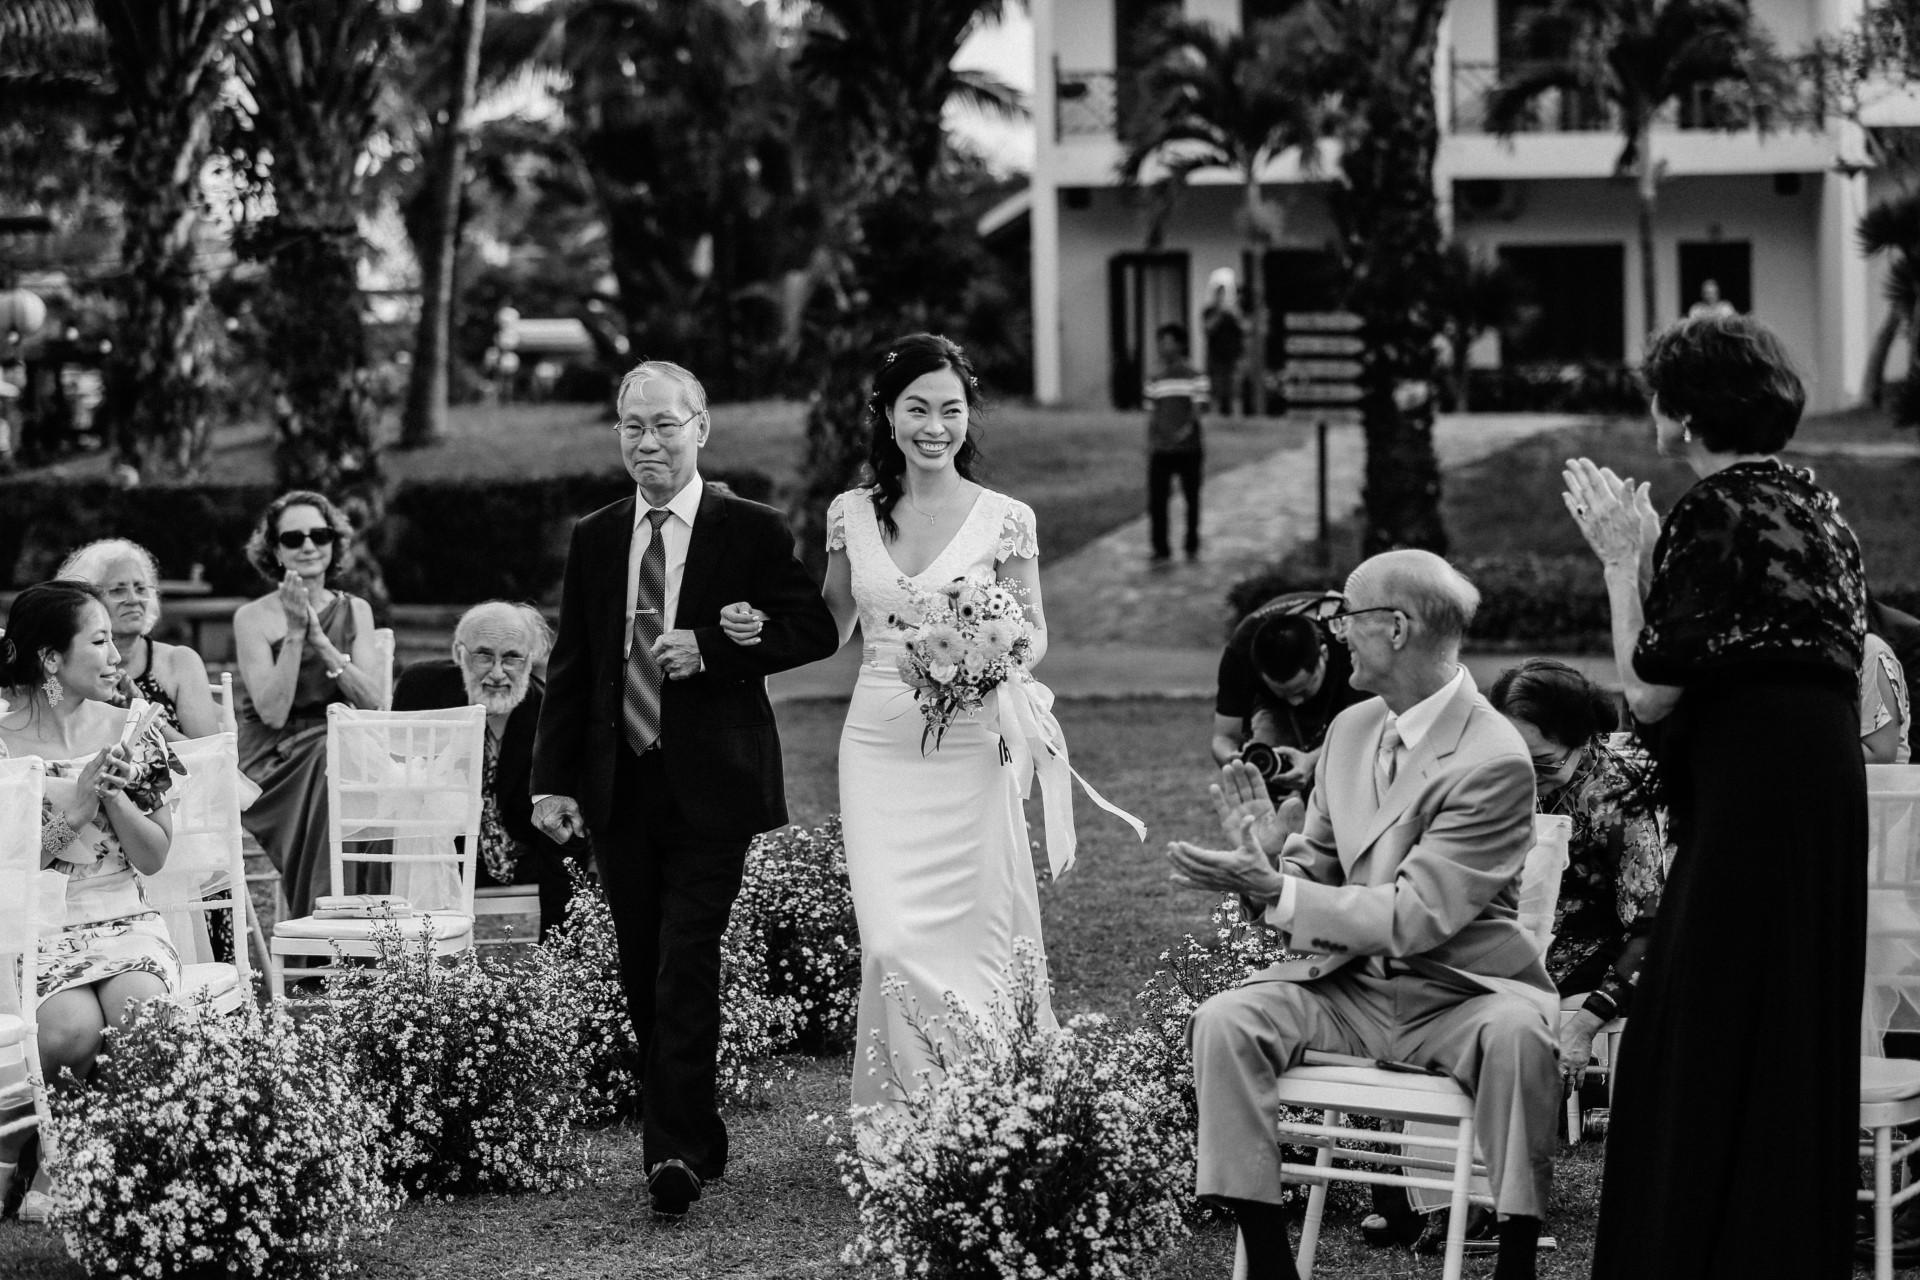 anh phan photographer | hoi an wedding photographer | hoian wedding ceremony | wedding in hoi an tropical beach resort | da nang photographer | da nang wedding photographer | da nang photographer | vietnam wedding photographer | vietnam photographer